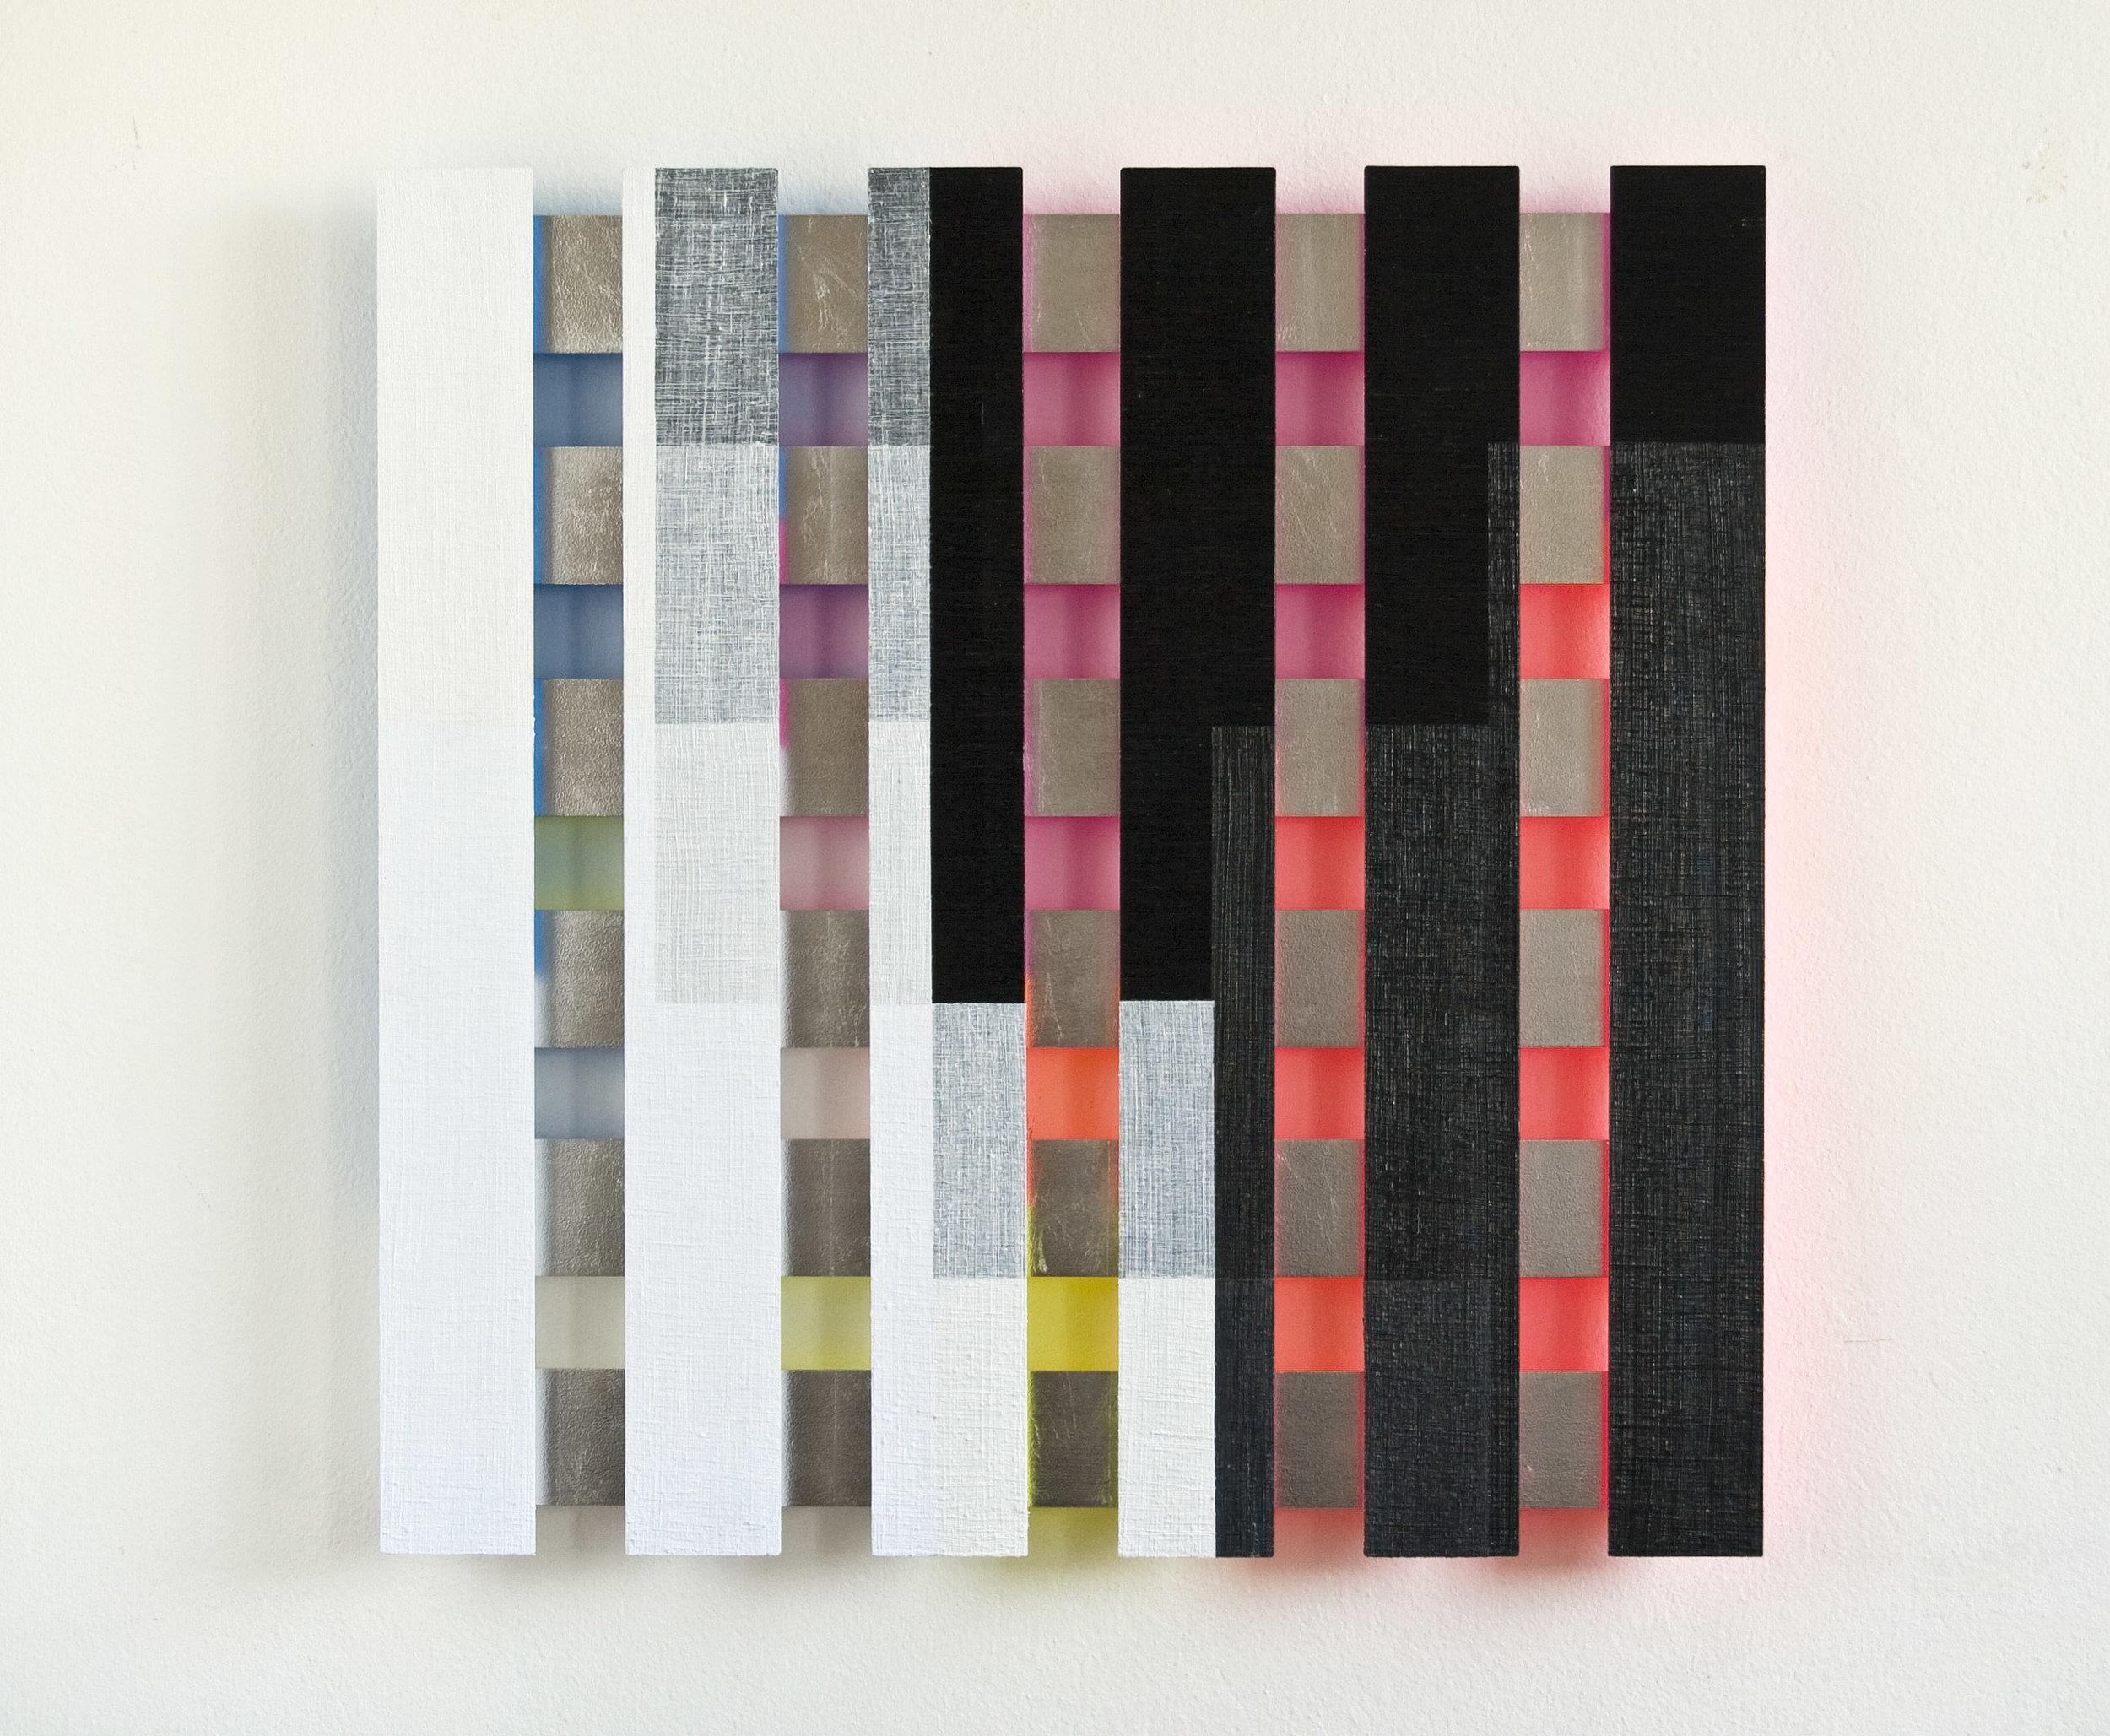 2p akril, les, 79 x 79 cm, 2009.jpg